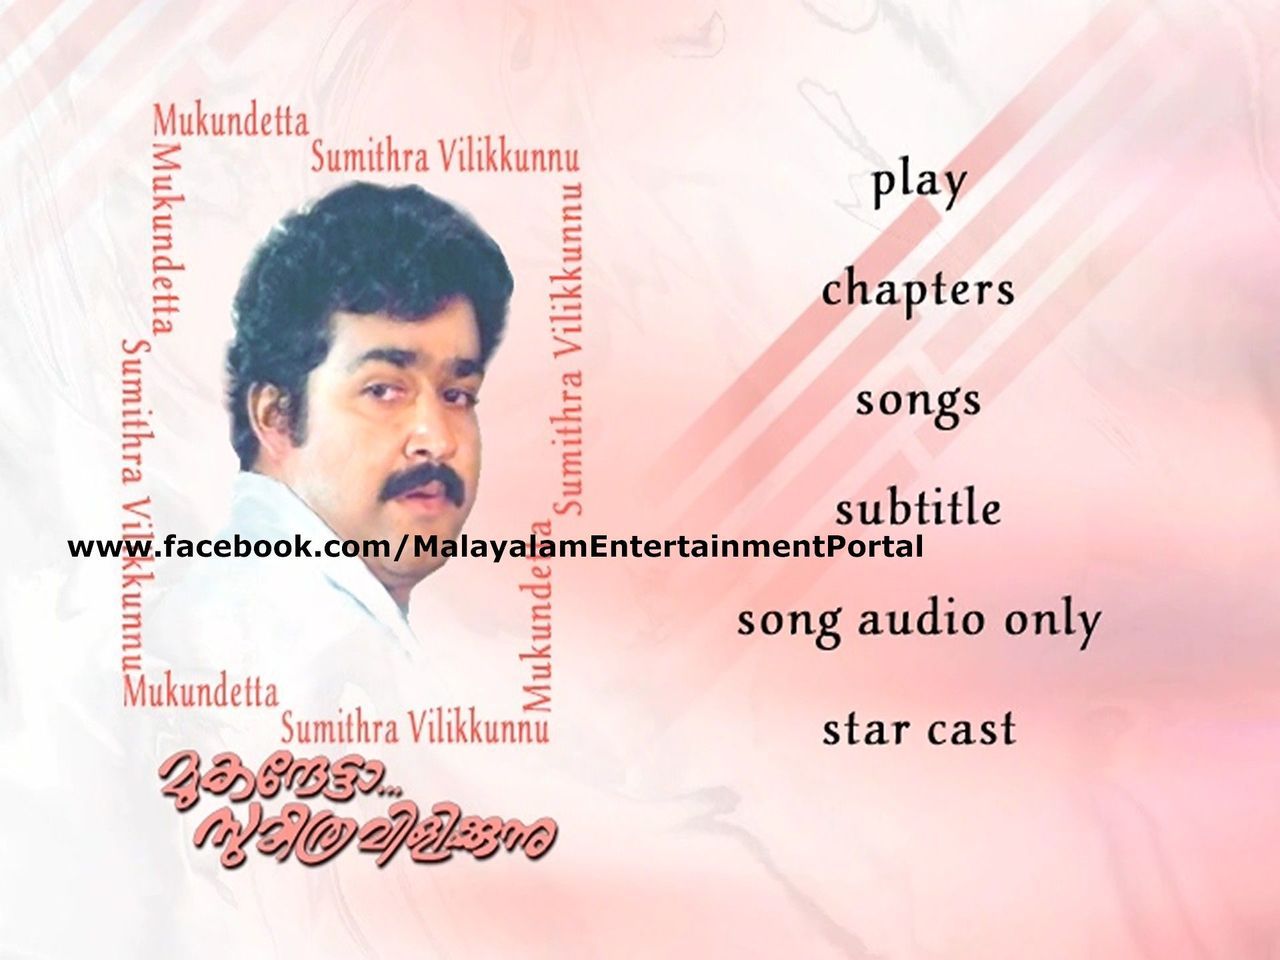 Mukundetta Sumithra Vilikyunnu Saina DVD Screenshots Bscap0000